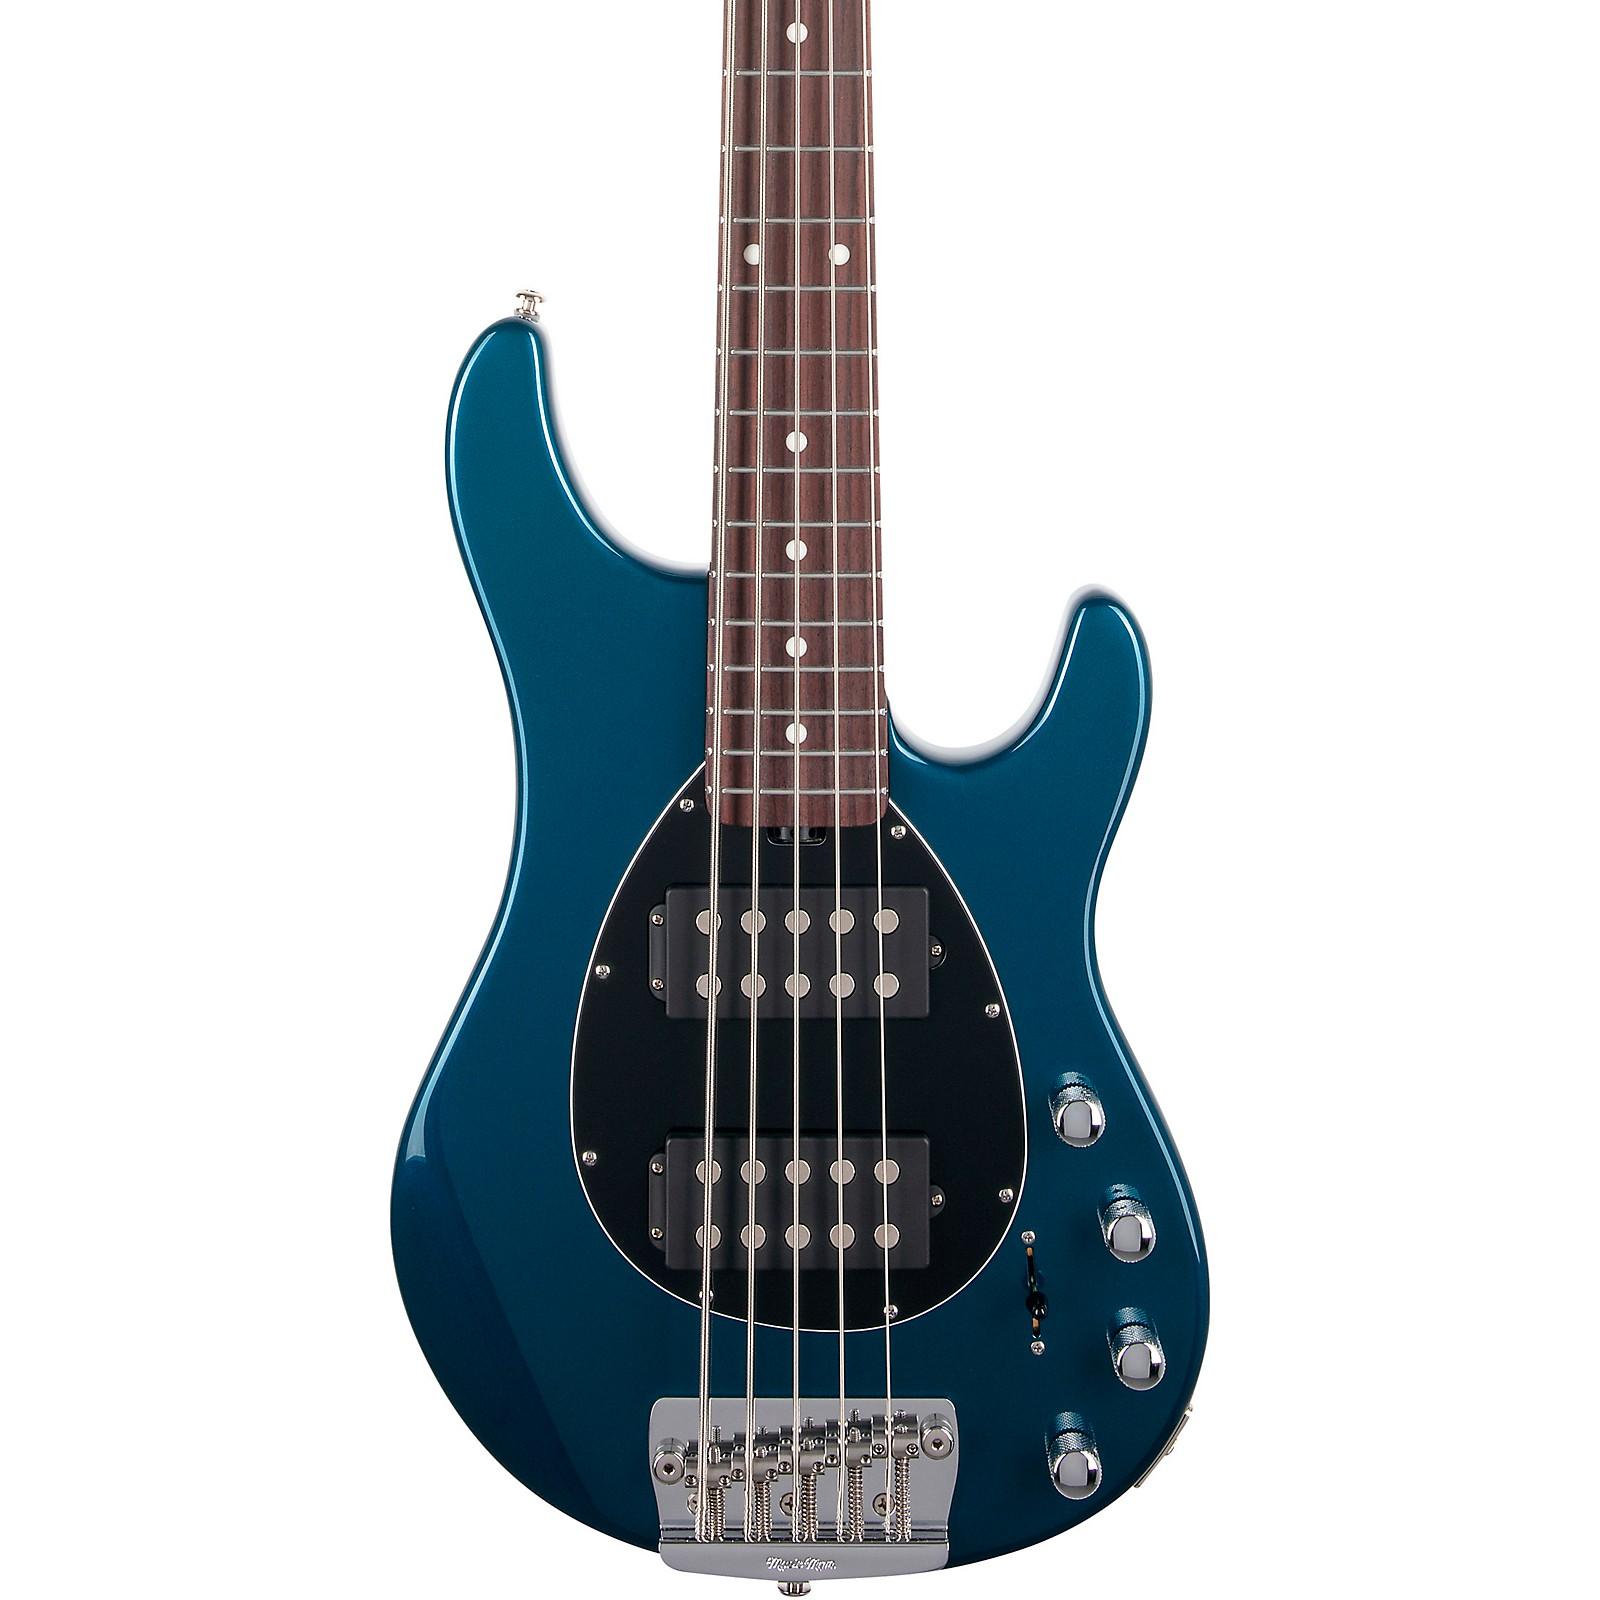 Ernie Ball Music Man Sterling 5 HH Bass